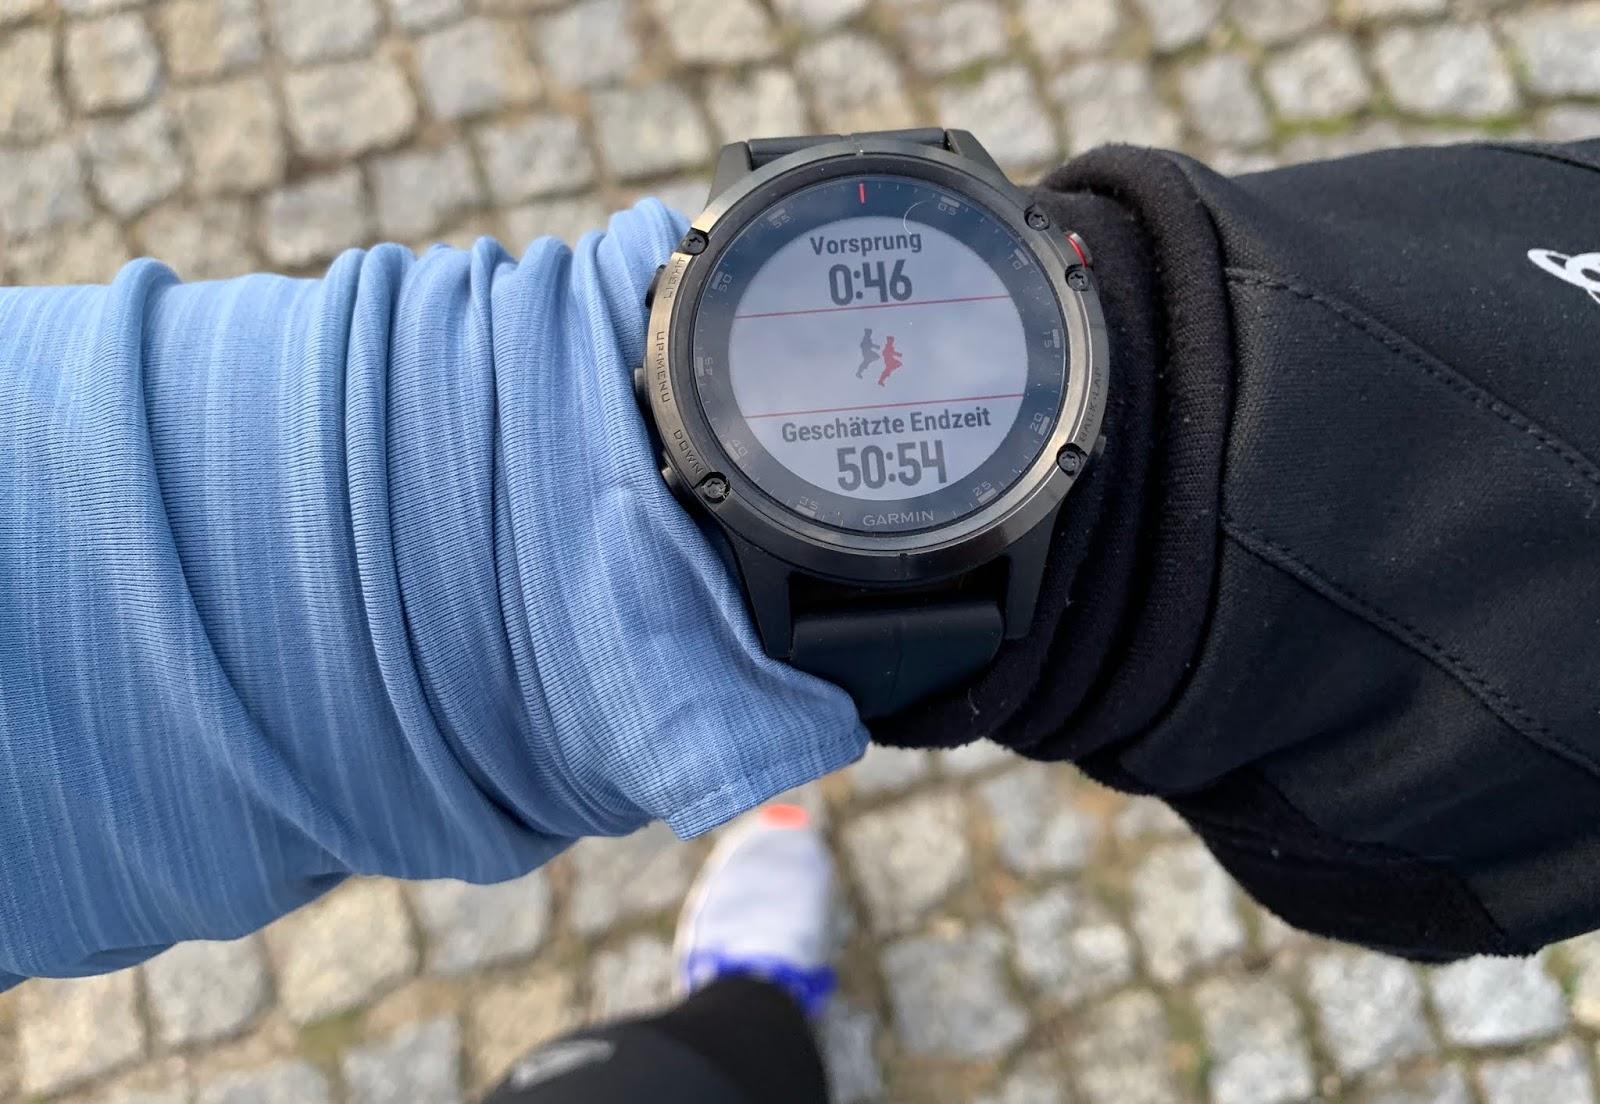 Review Die Garmin Fenix 5 Plus Im Test Run With Lars